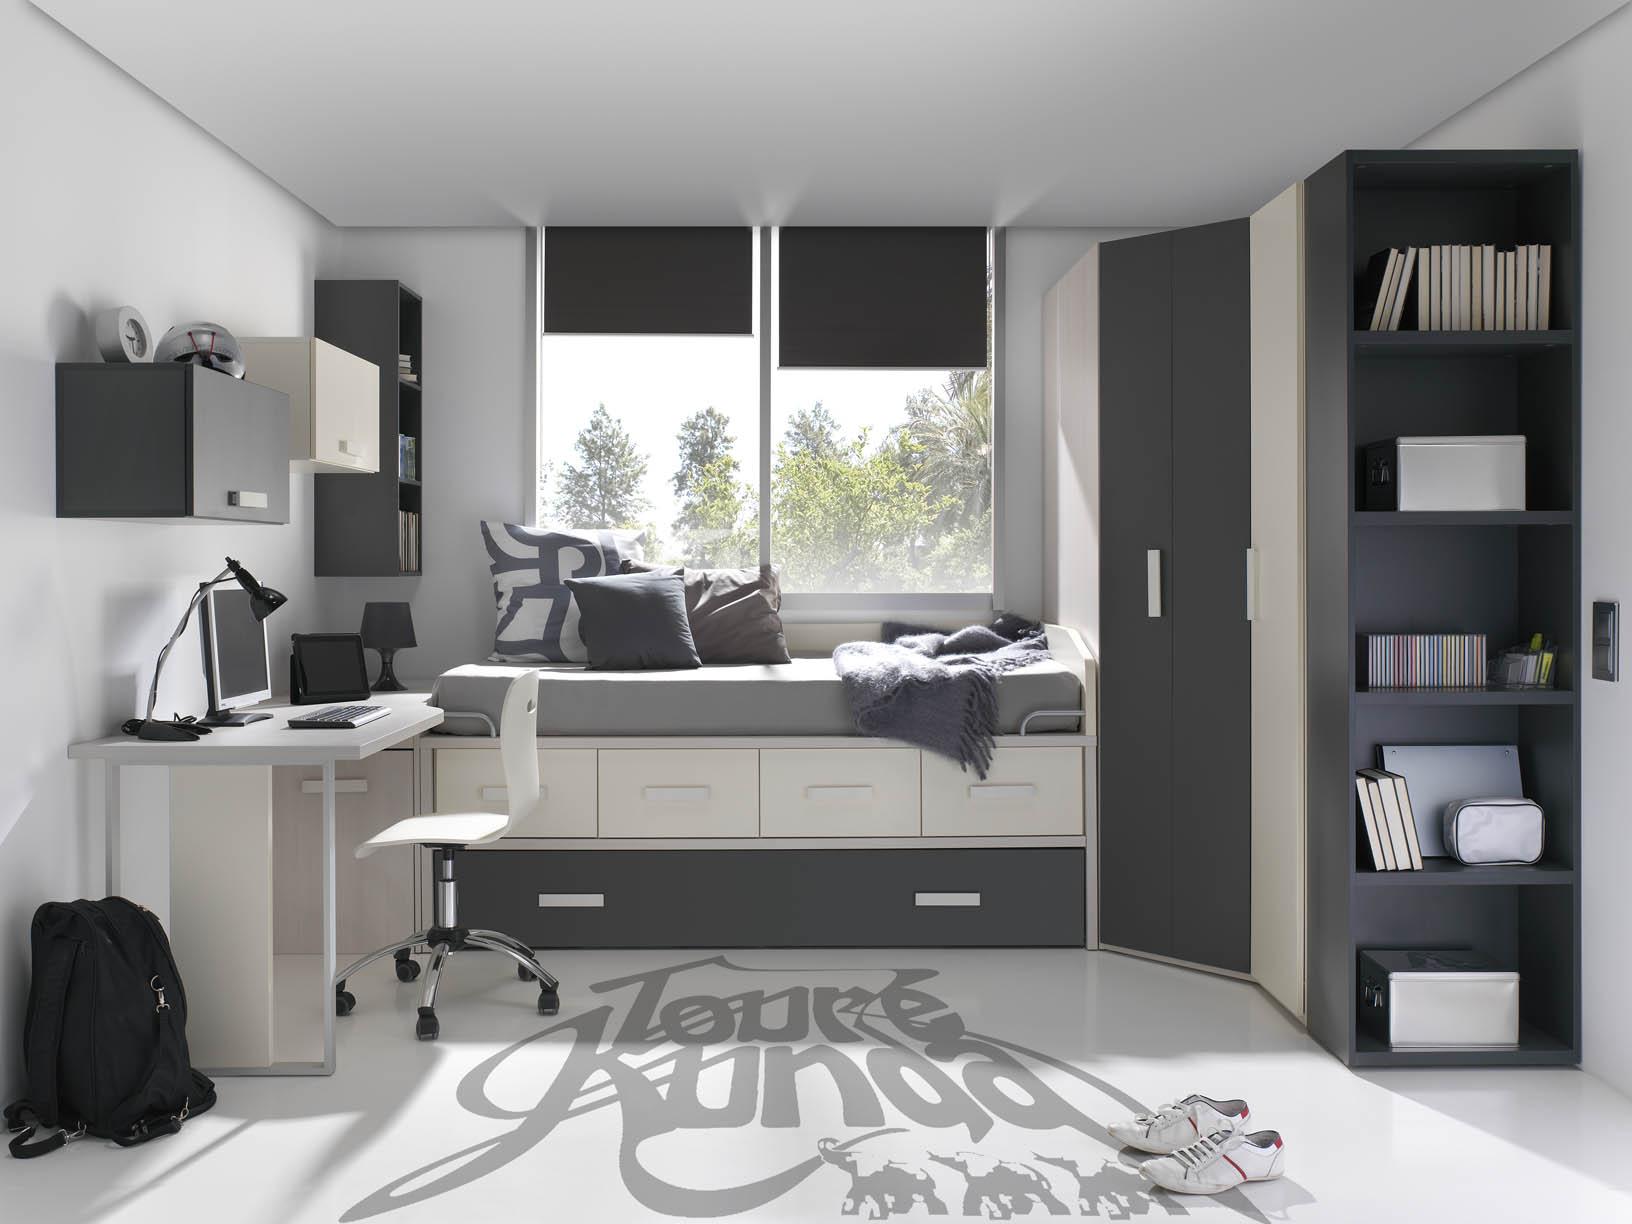 Ambientes juveniles muebles orts blog - Habitacion juvenil chico ...